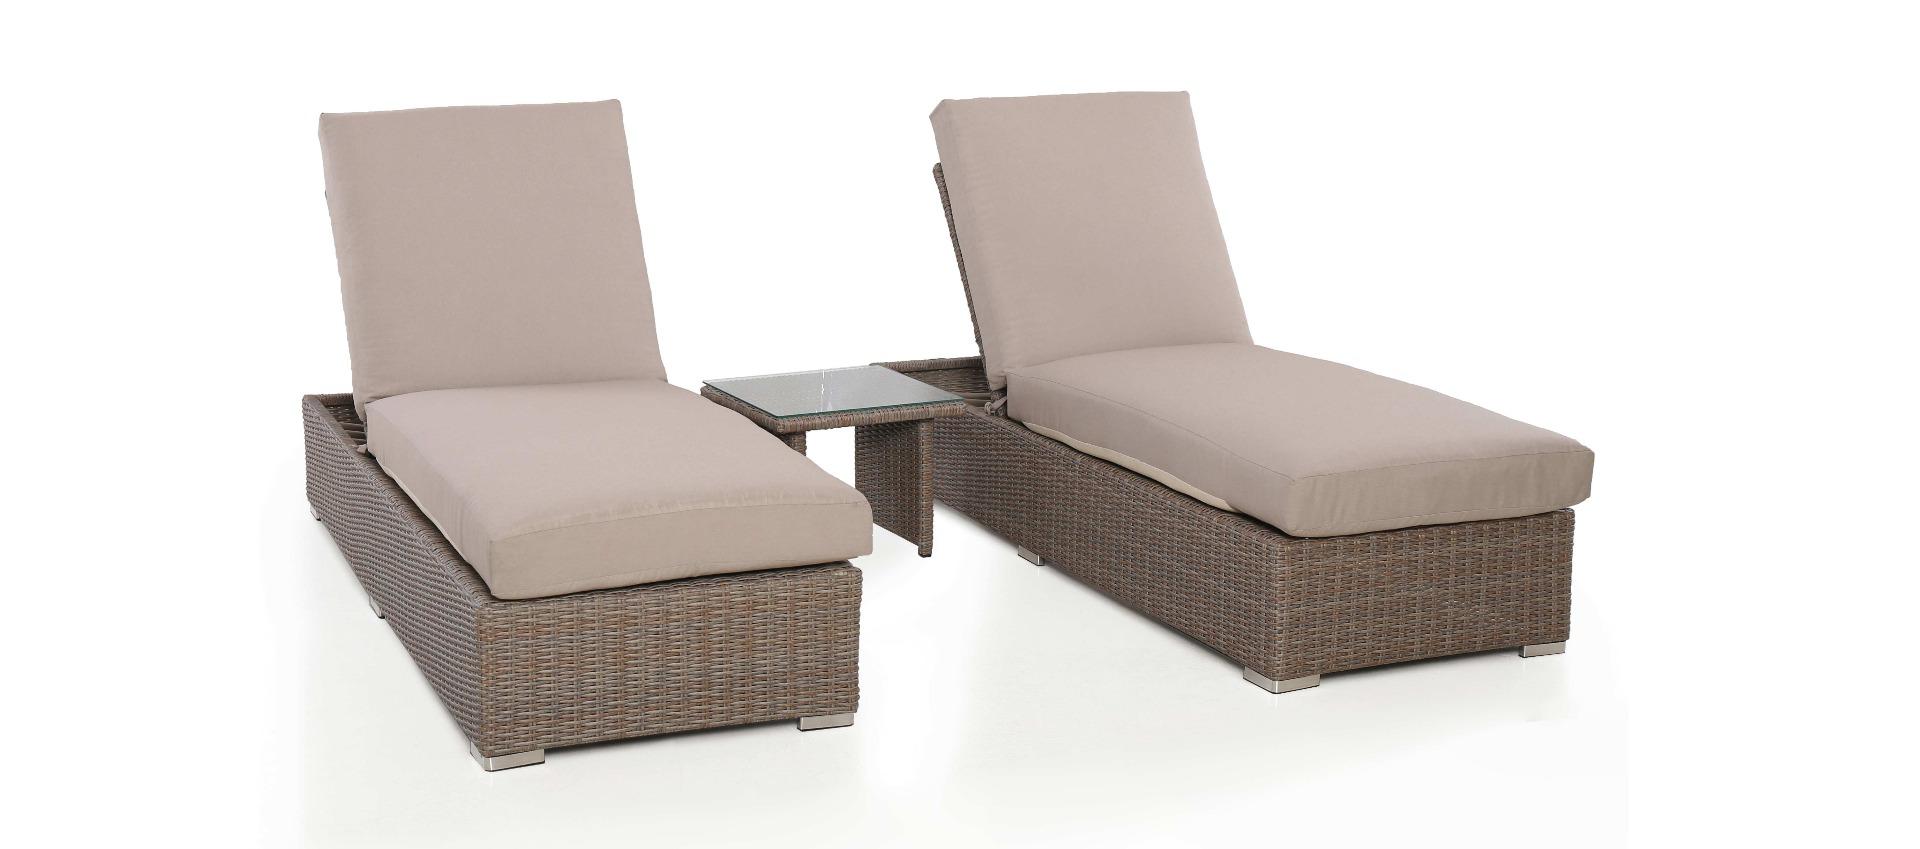 Maze Rattan - Harrogate Sun Lounger Set - With Weatherproof Cushions